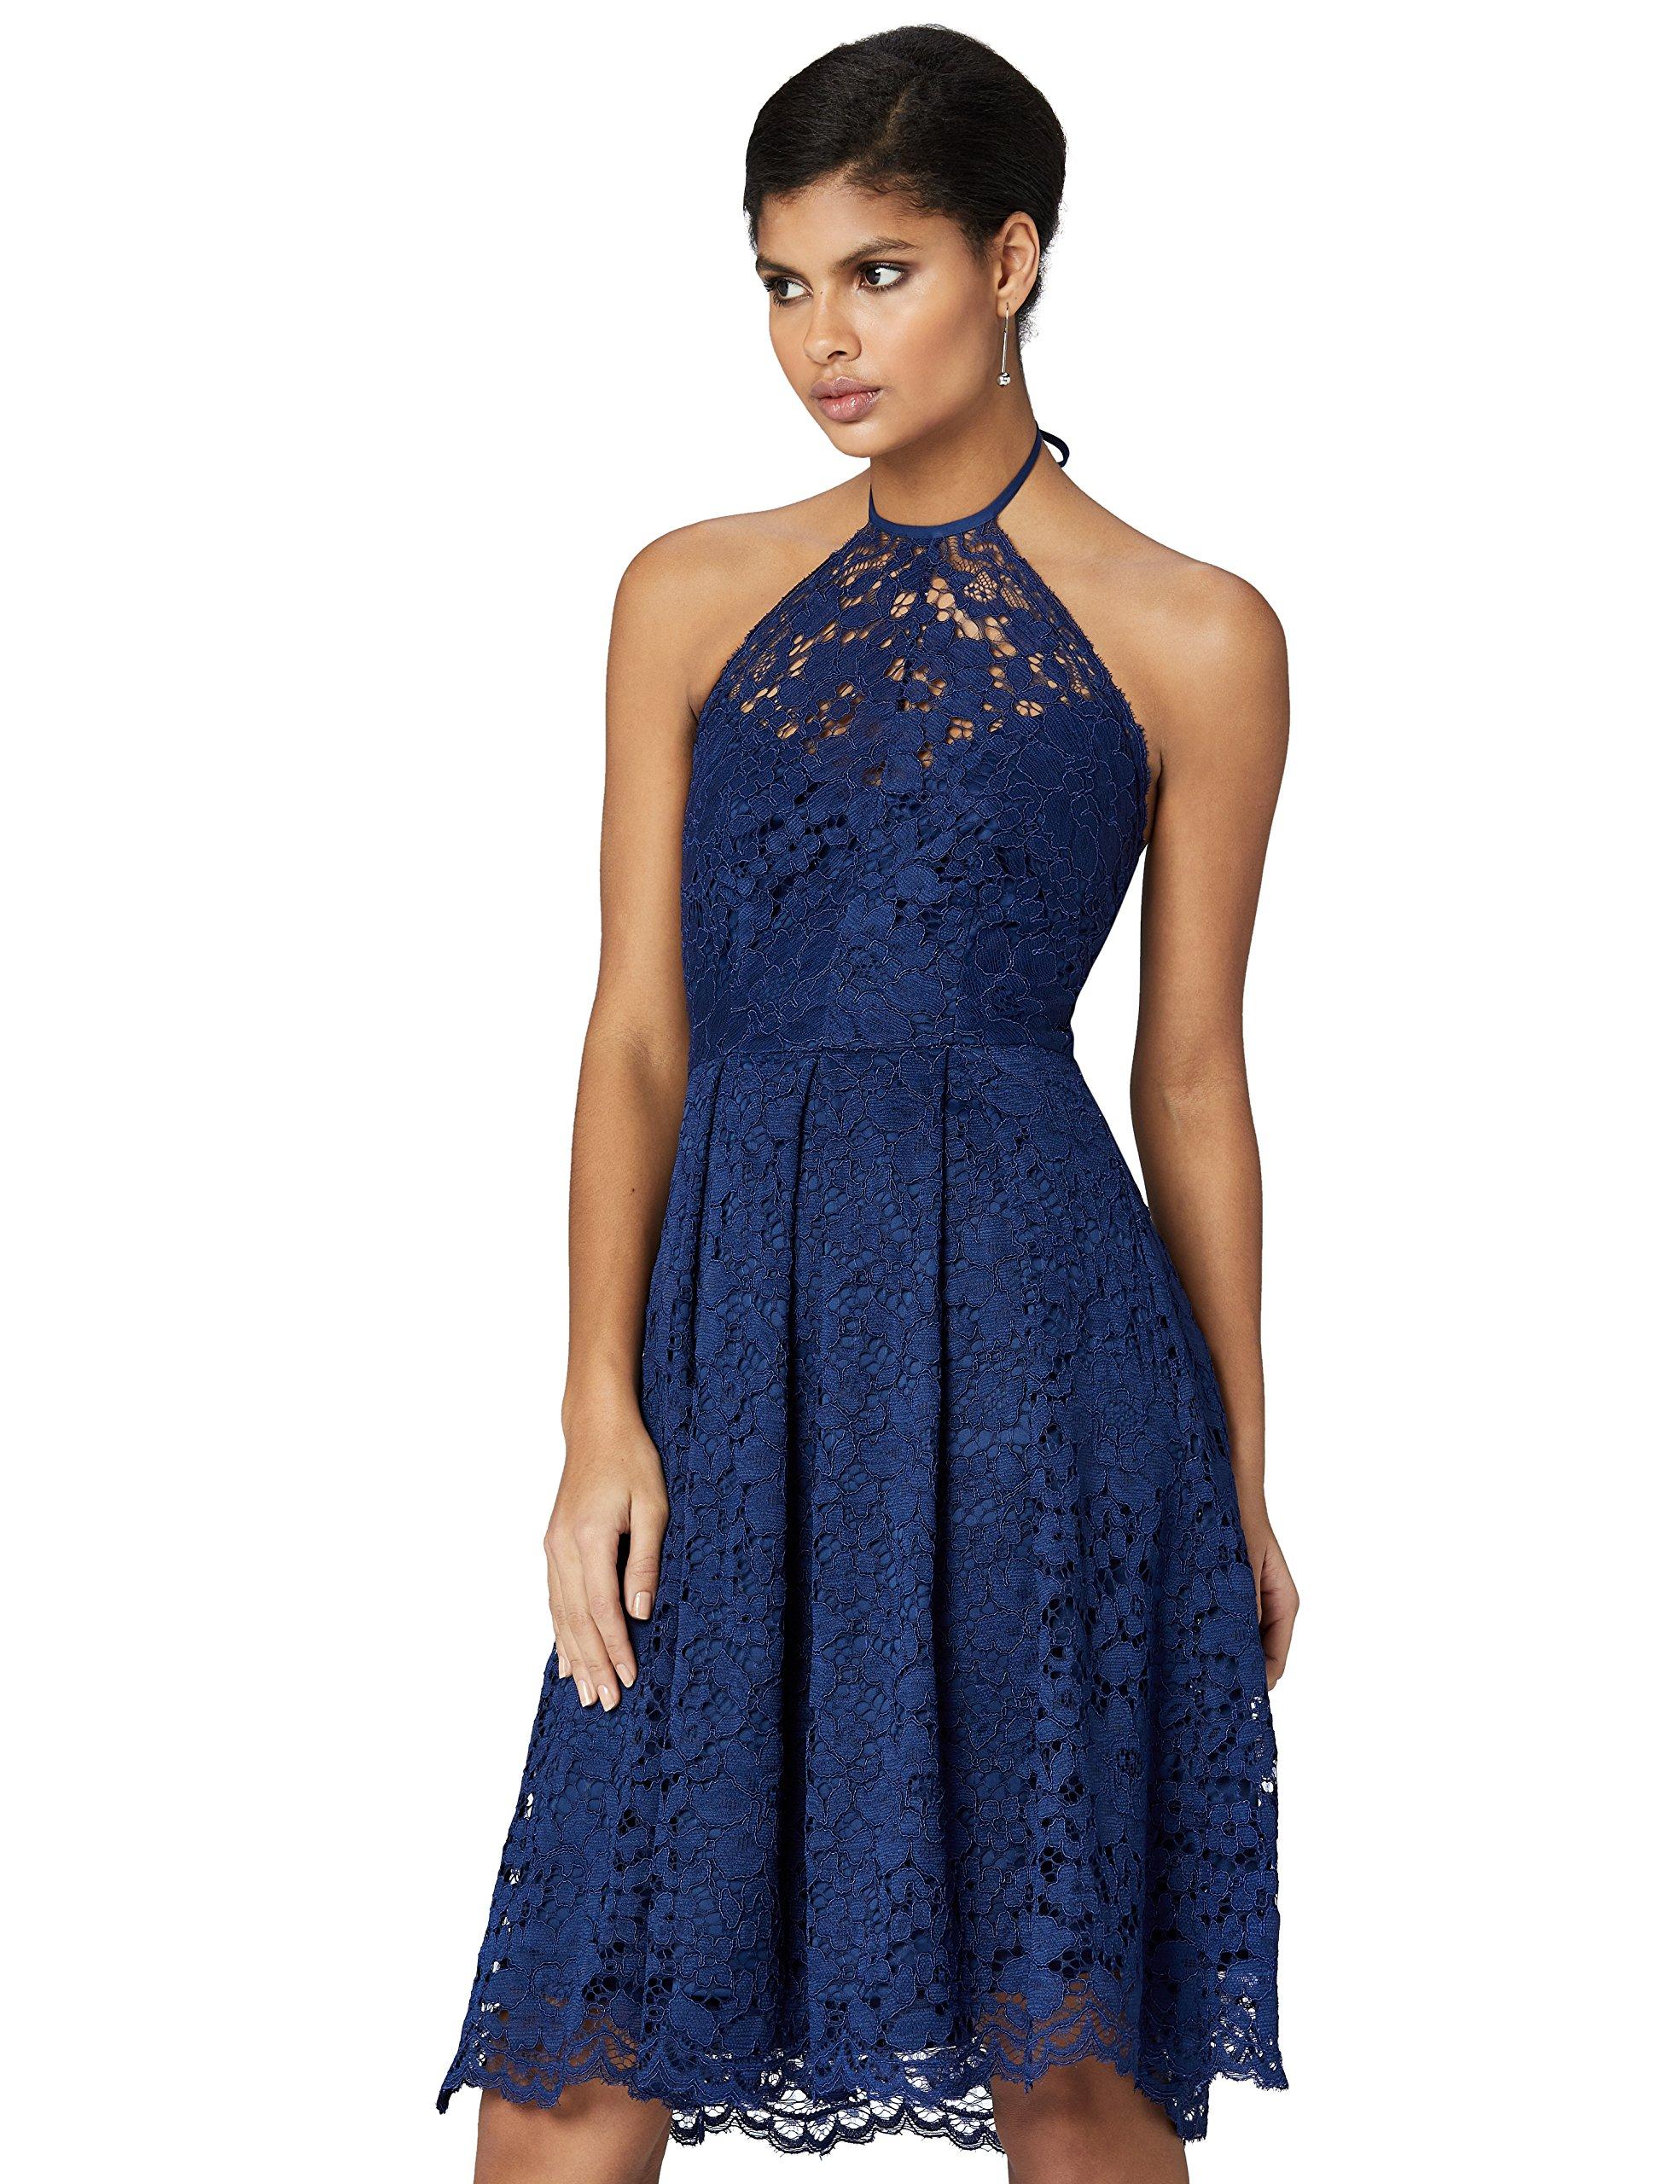 Truthamp; Blue38taille Robes FabricantSmall 13839 De CérémonieBleumedival Fable F5uK3Tl1Jc